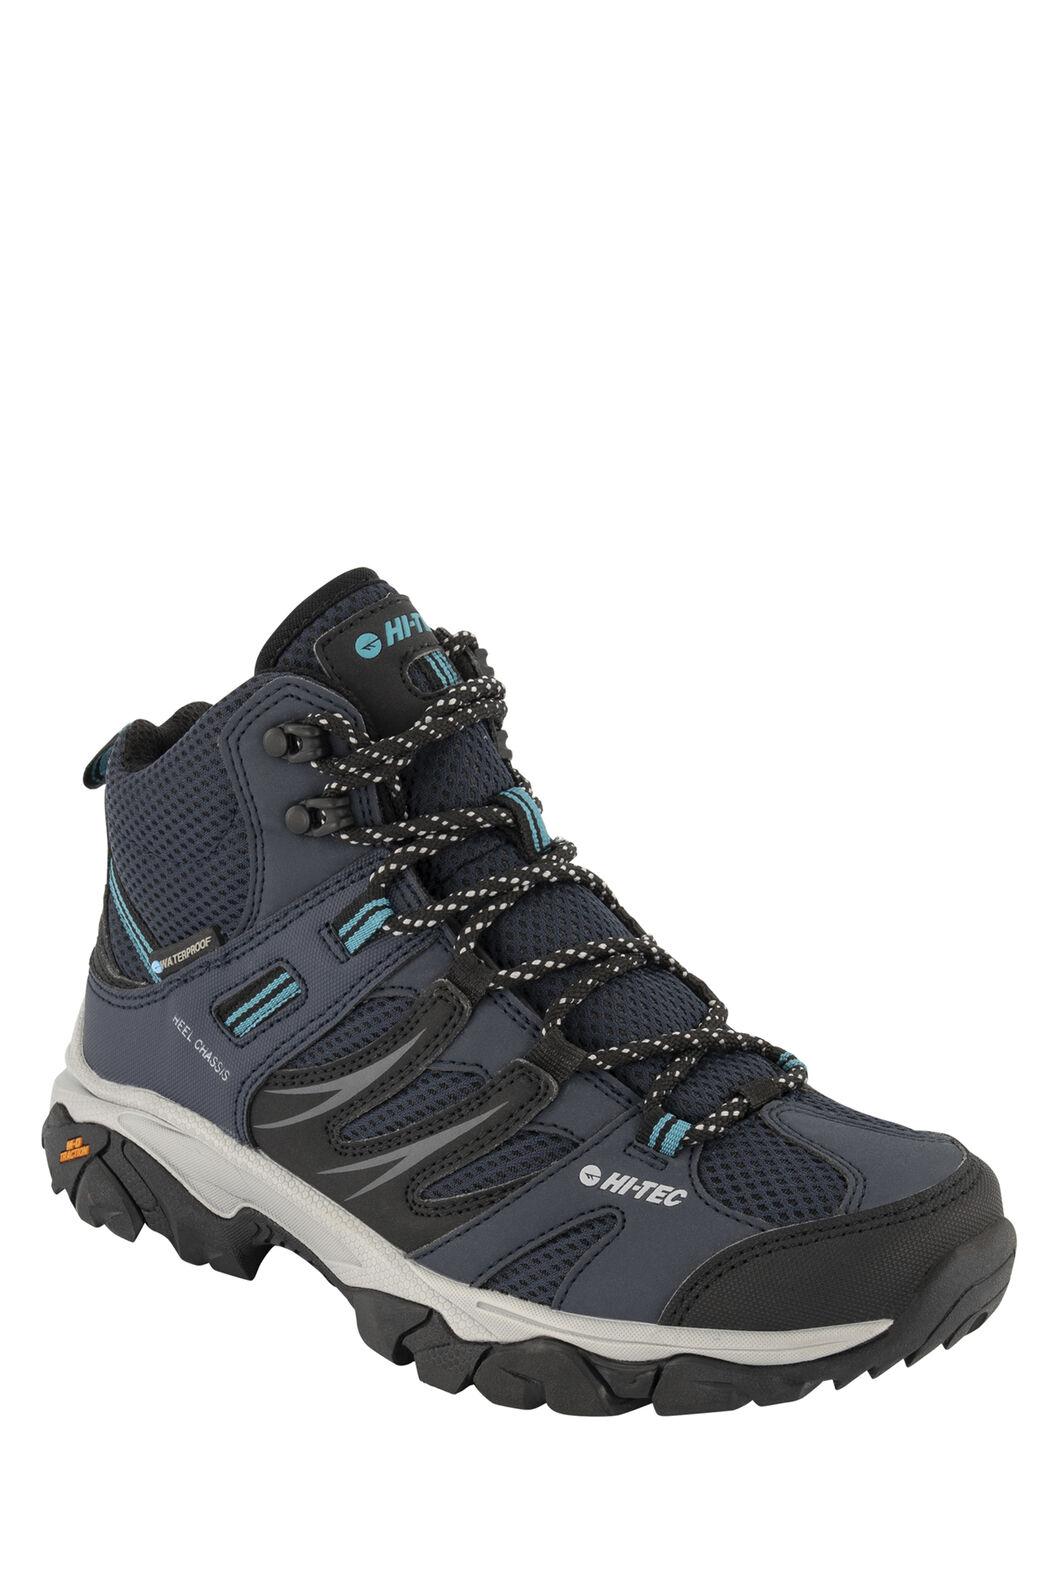 Hi-Tec Tarantula WP Mid Hiking Shoes — Women's, Night/Black Navigate, hi-res